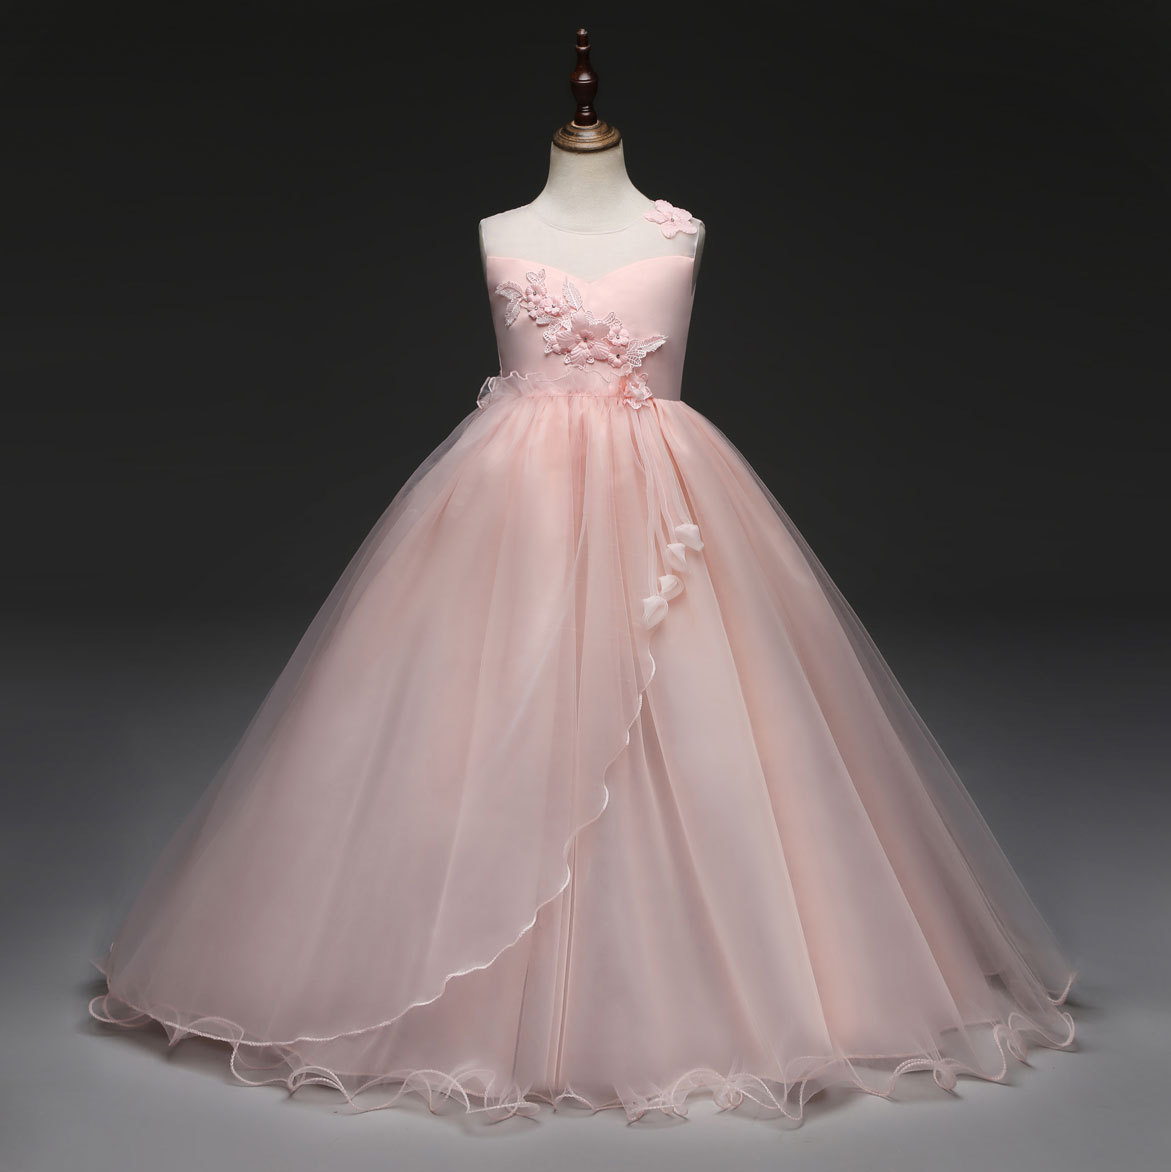 Gowns For Girls: Luxury Petticoat Children Flower Girl Trumpet Pink White